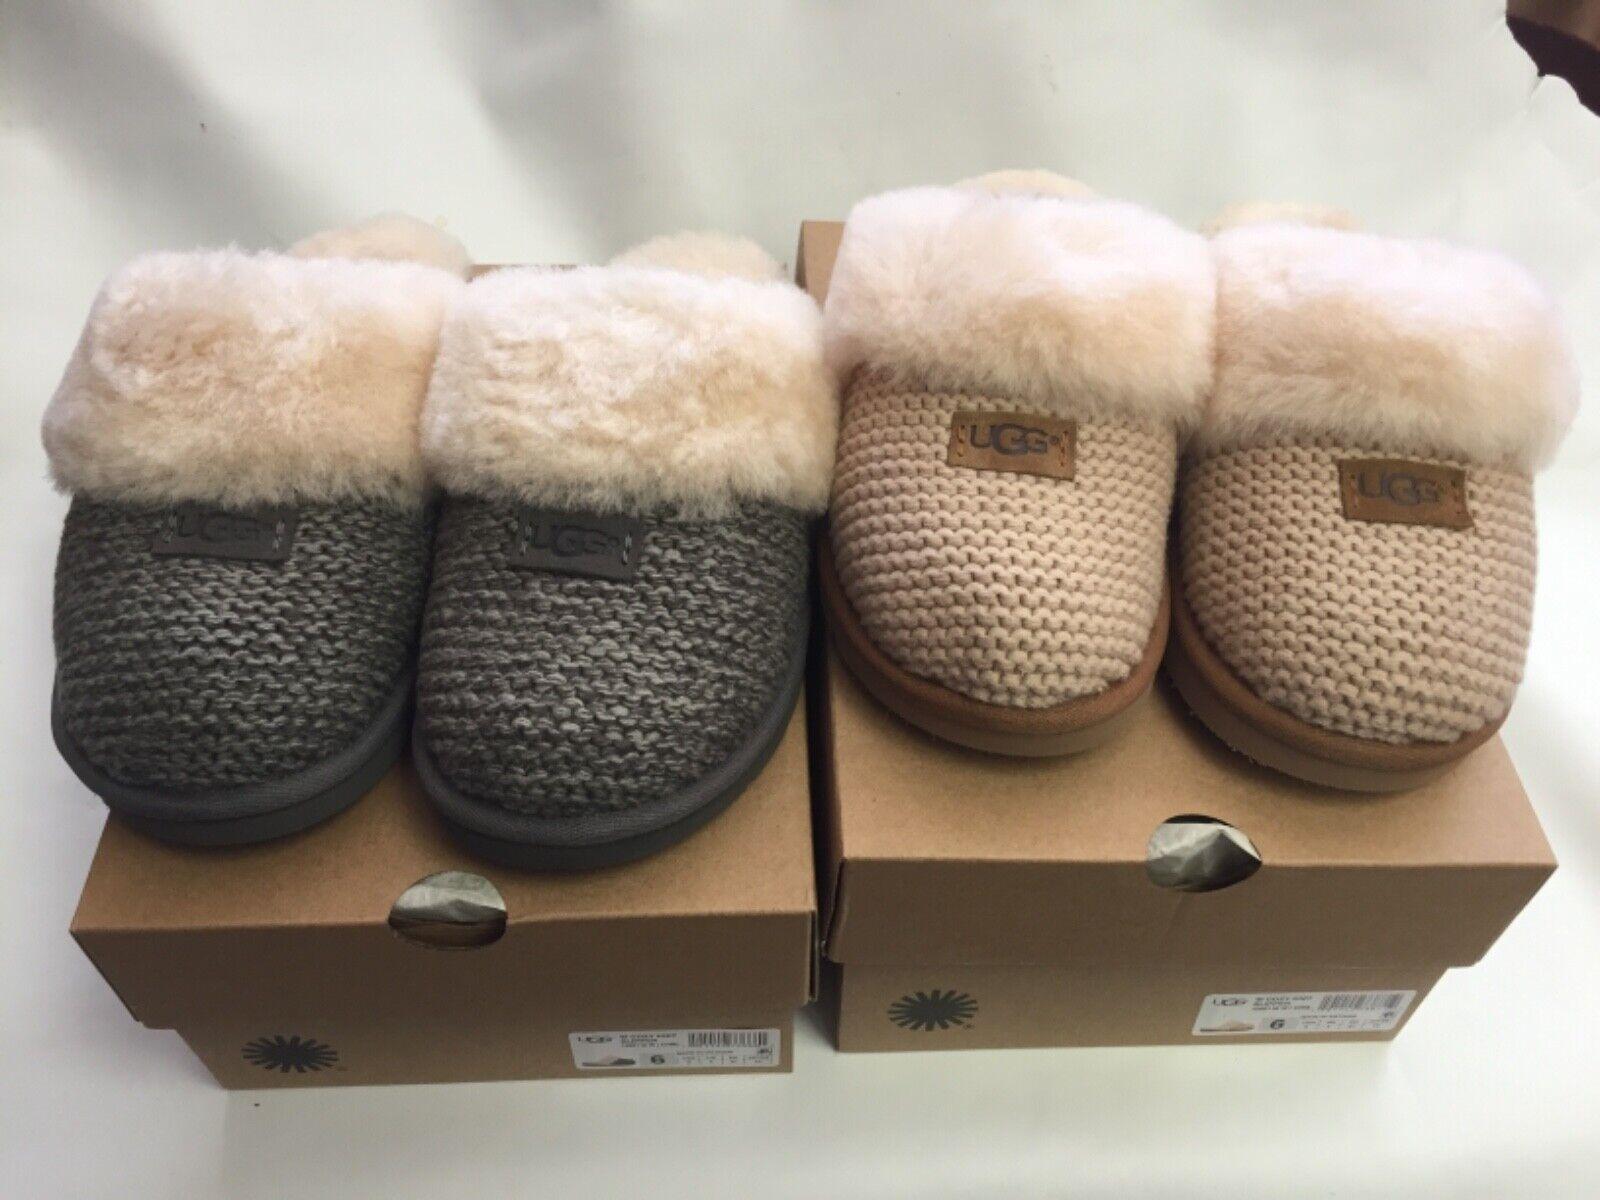 d9be6659853 6 Slippers | Slippersguide.biz